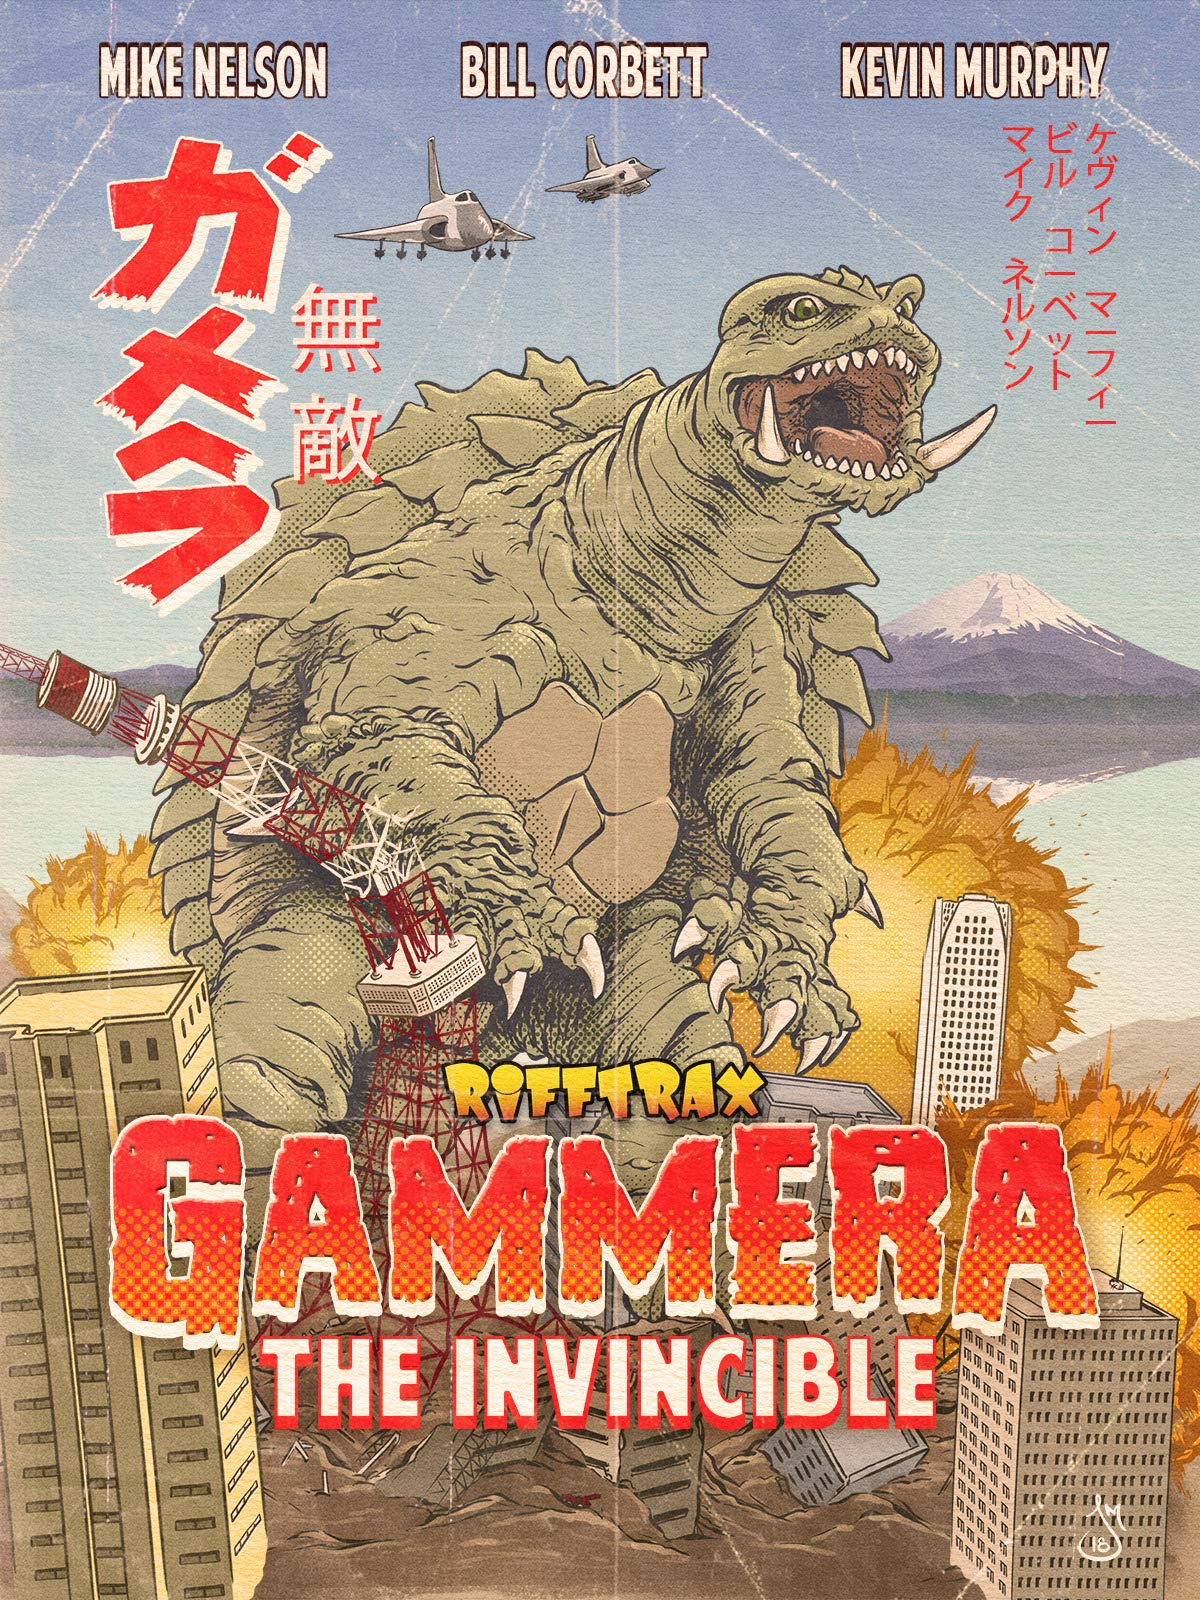 RiffTrax: Gammera the Invincible on Amazon Prime Video UK